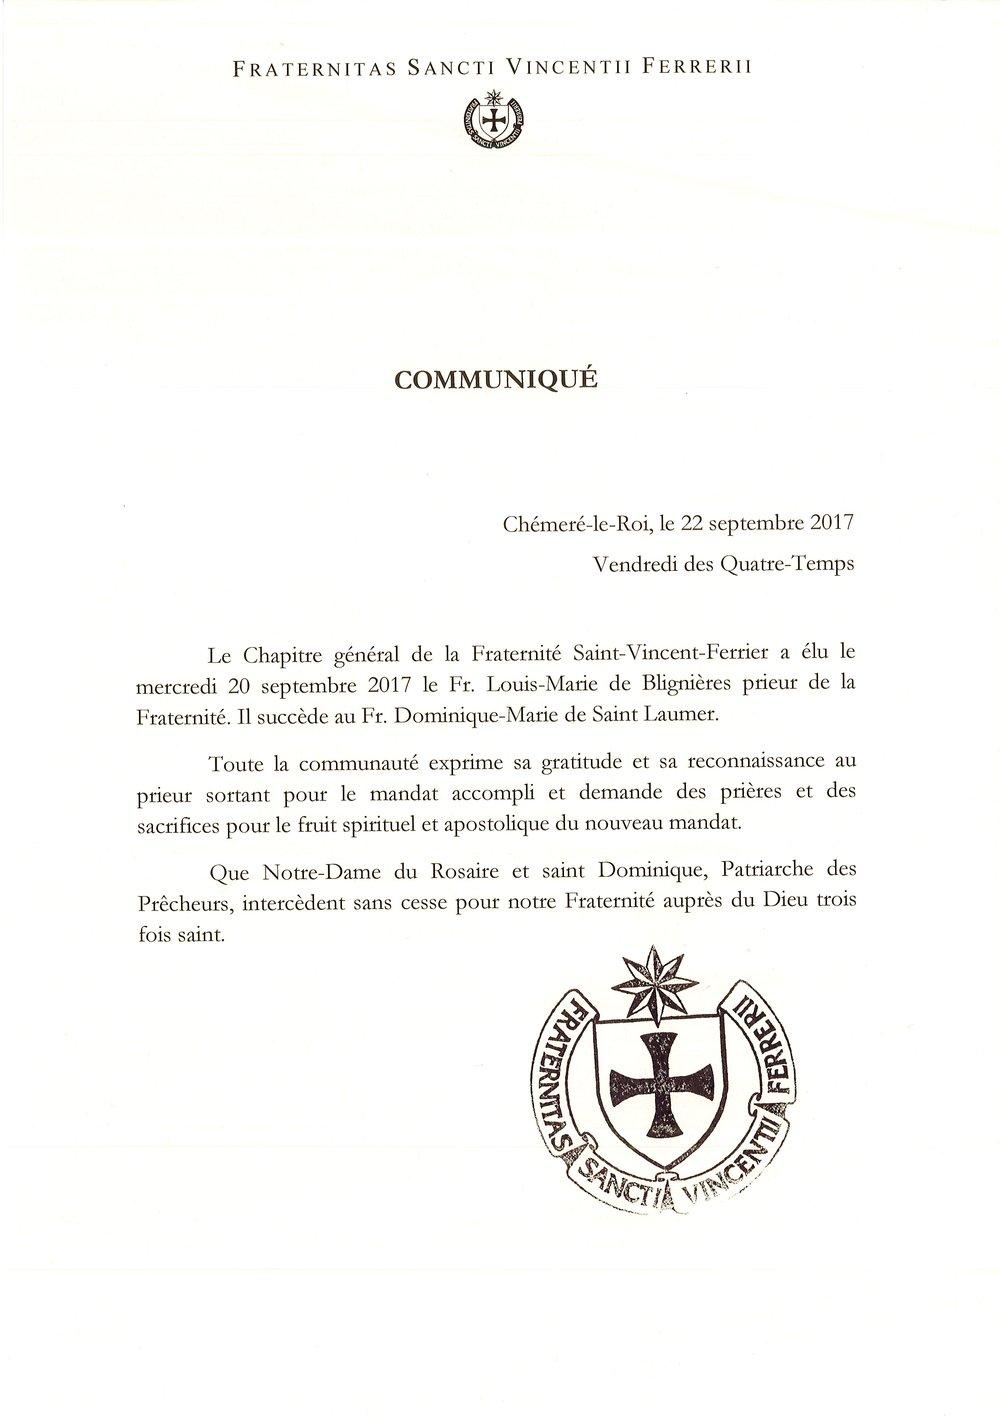 CommuniquéFSVF.jpg